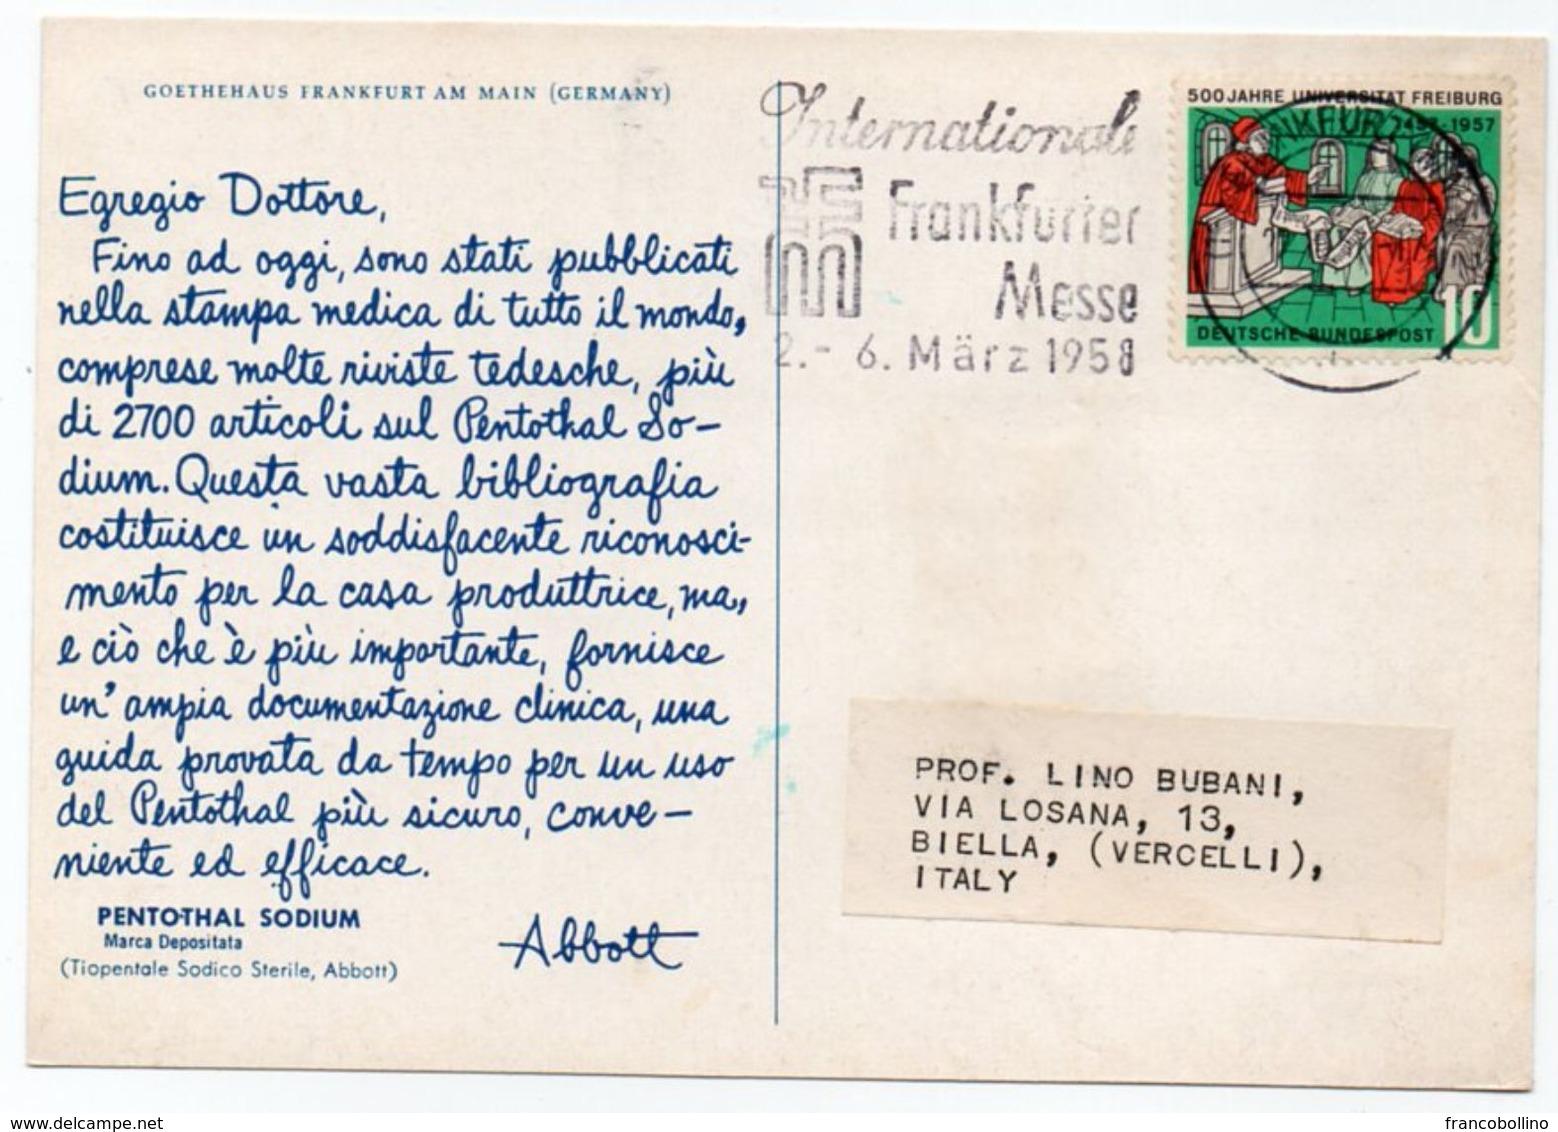 DEAR DOCTOR TYPE PUBL. PENTOTHAL SODIUM / ABBOTT - GERMANY GOETHEHAUS FRANKFURT AM MAIN - Salute